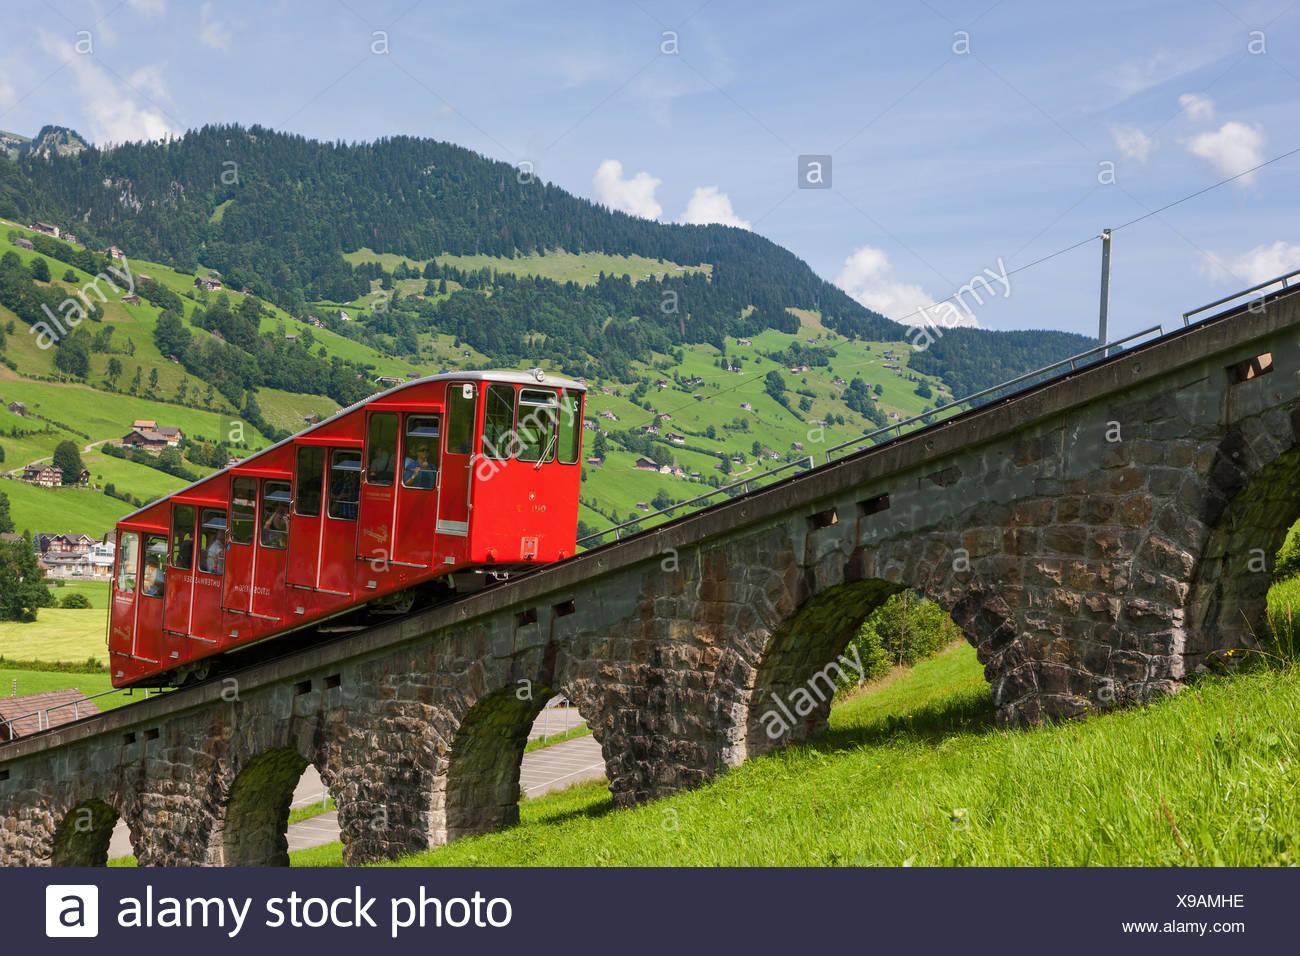 Iltiosbahn, Schweiz, Europa, Kanton St. Gallen, Toggenburg, Mountain Road, Standseilbahn, Eisenbahn, Stockbild